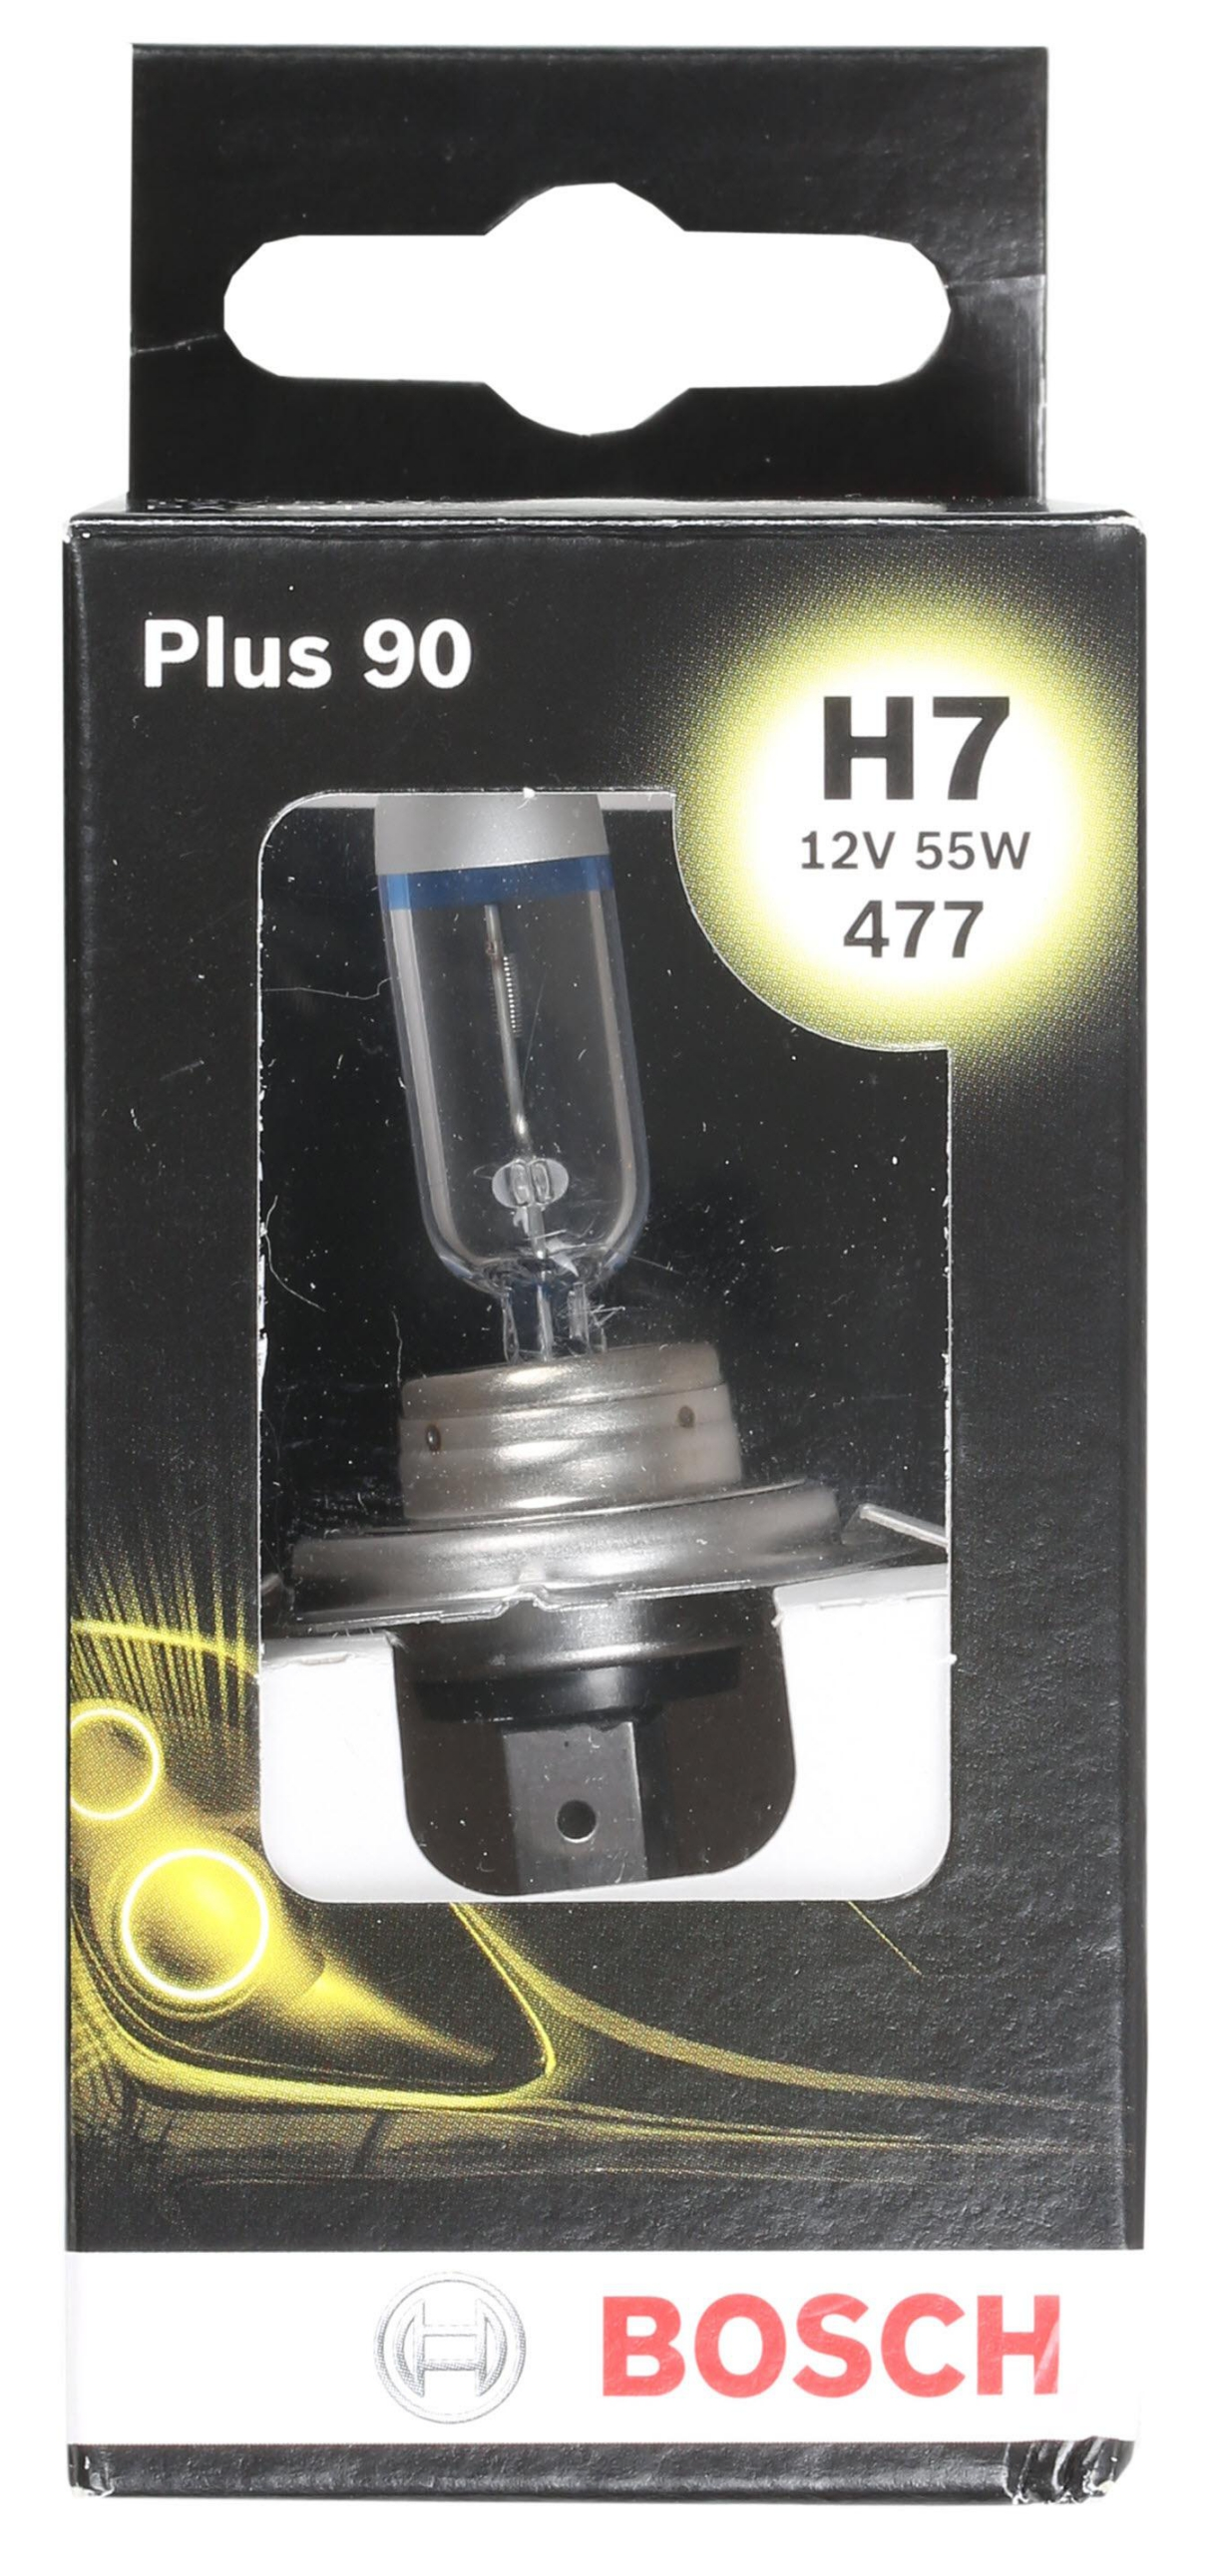 bosch plus 90 car front headlamp bulb 477 x1 h7 55w 12v. Black Bedroom Furniture Sets. Home Design Ideas